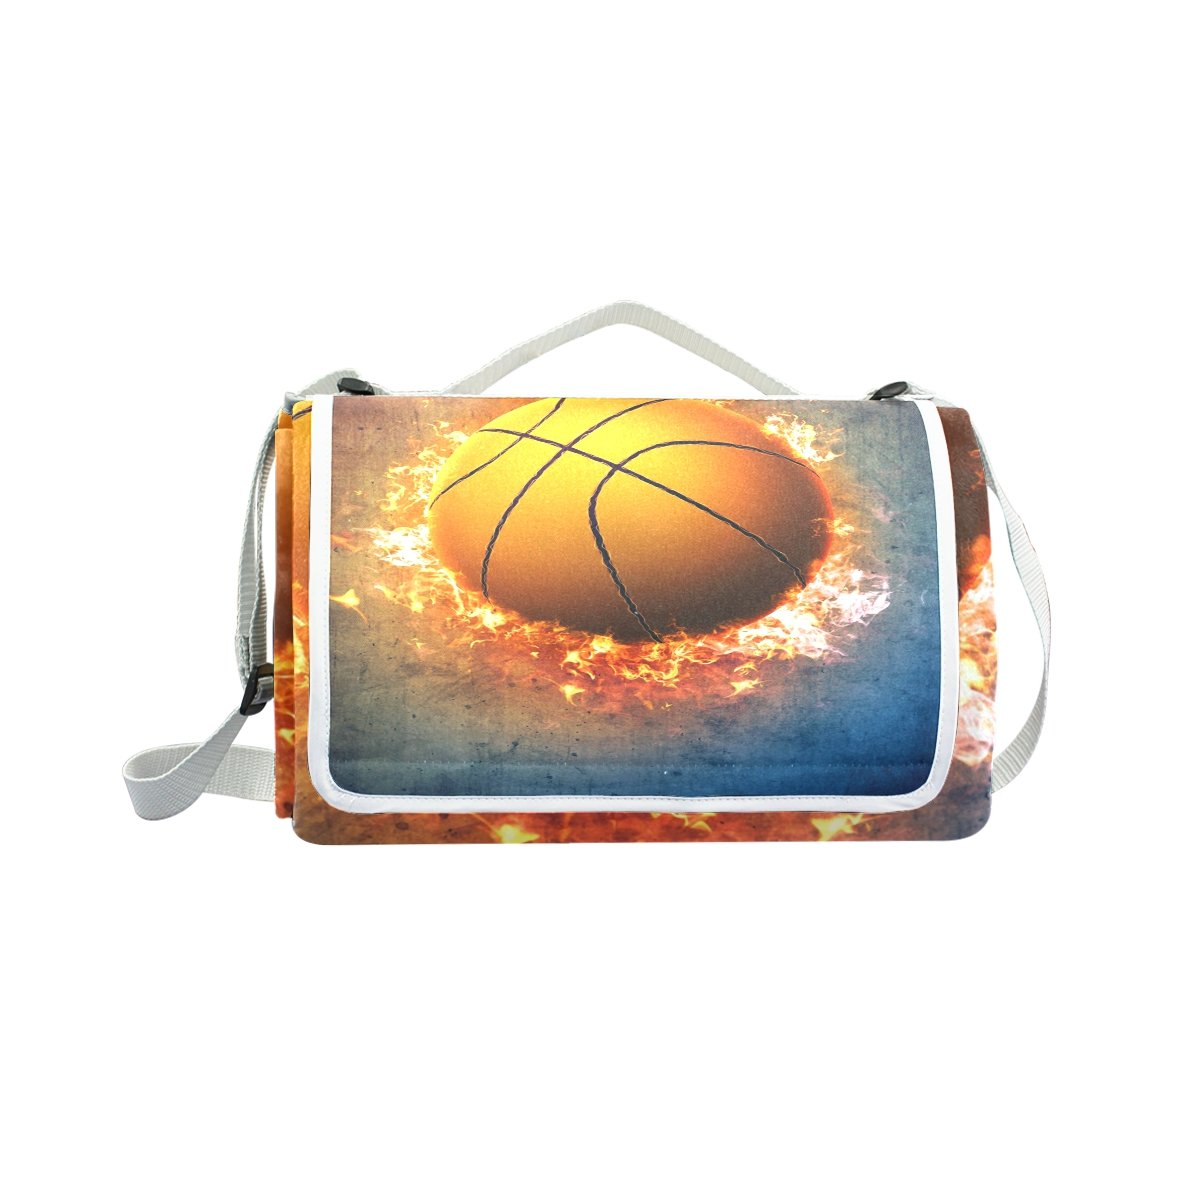 My Little Nest Outdoor Camping Picnic Beach Blanket Mat Basketball Lightweight Portable Folding Travel Pad 57'' x 59'' by My Little Nest